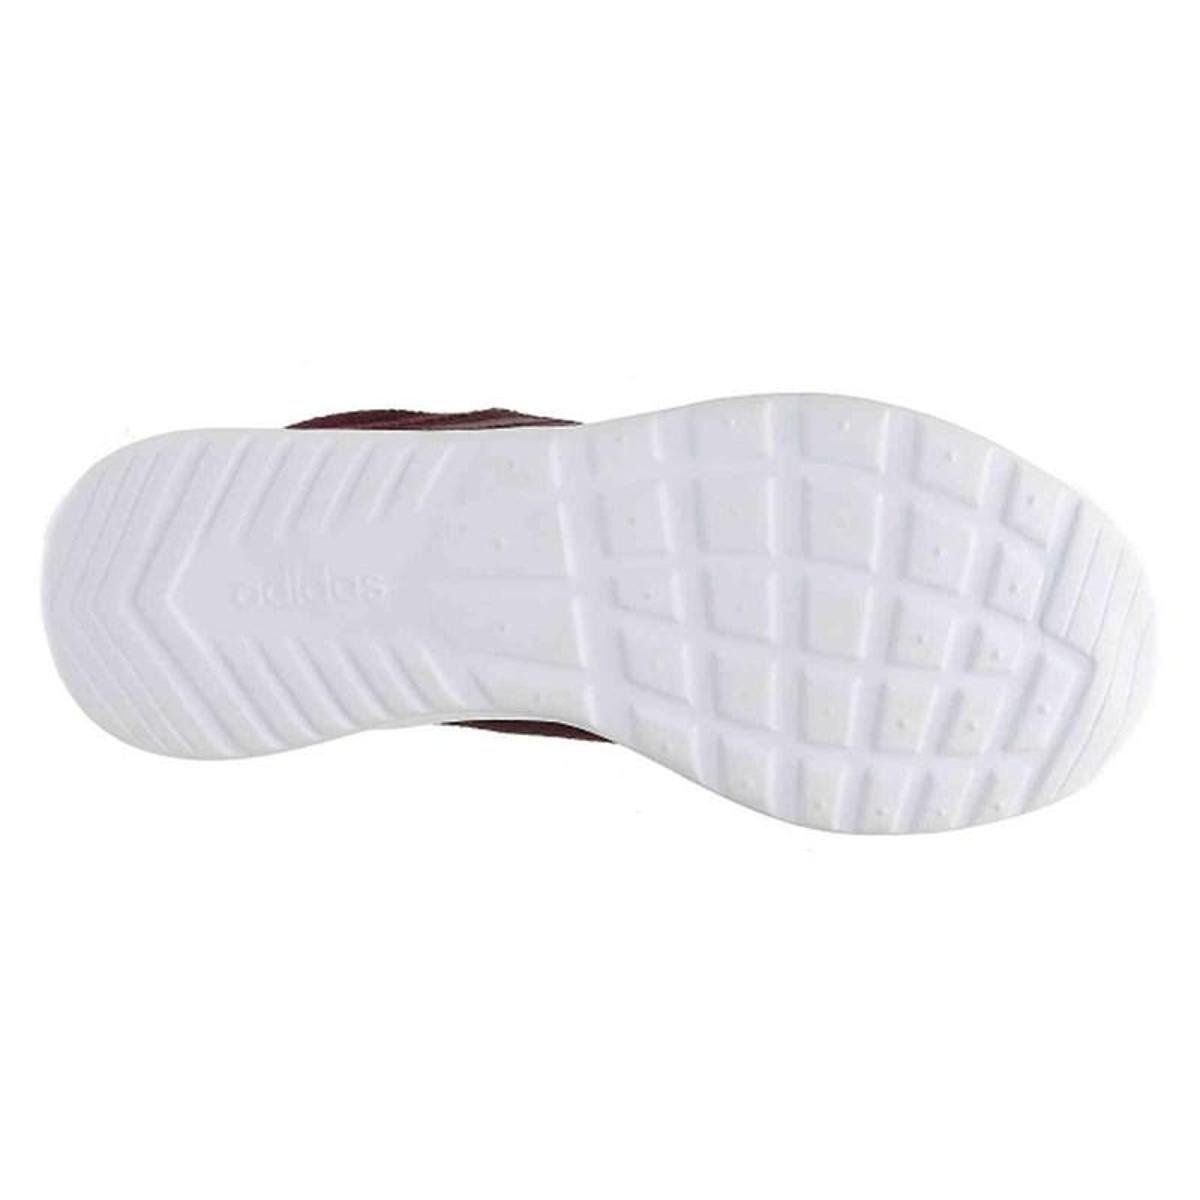 Tênis Feminino Adidas Bordô Tênis Pure Cloudfoam Adidas Cloudfoam W 4w4vxqSar